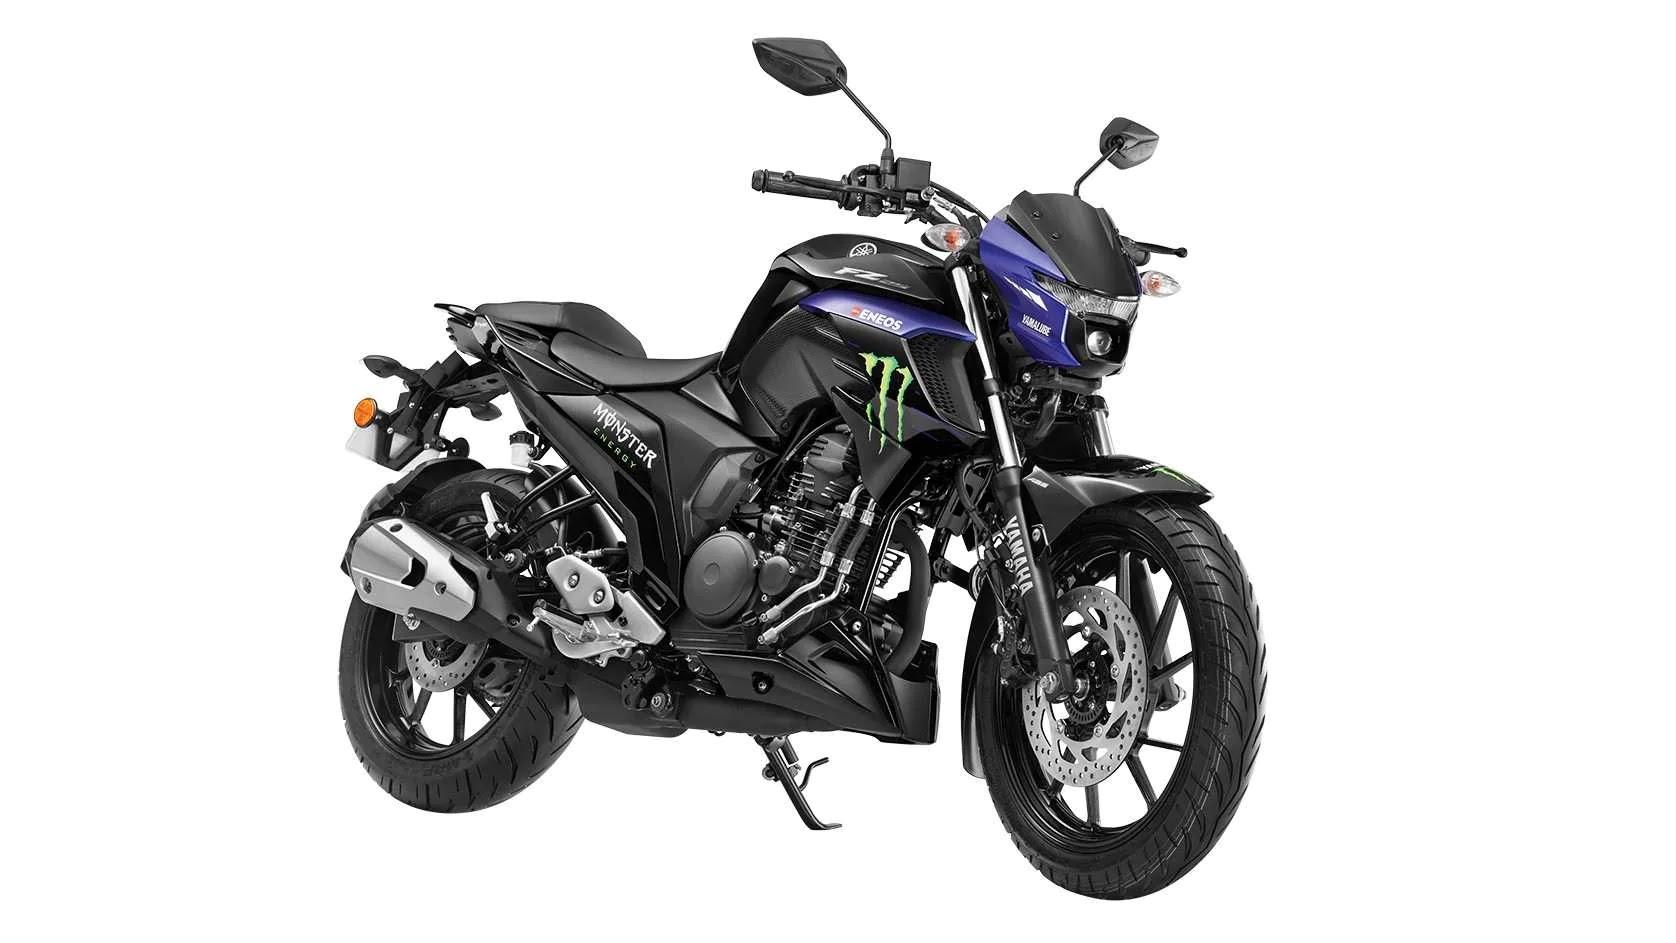 Yamaha FZ25 Moto,2022 Yamaha FZ25 Moto,yamaha fz25 motogp edition,yamaha fz25 motogp edition 2021,yamaha fz25 motogp price,yamaha fz25 motogp edition 2022,yamaha fz25 motogp limited edition,yamaha fz25 motor, yamaha motos fz25 ,yamaha motos fz25 precio,yamaha fz25 somos moto